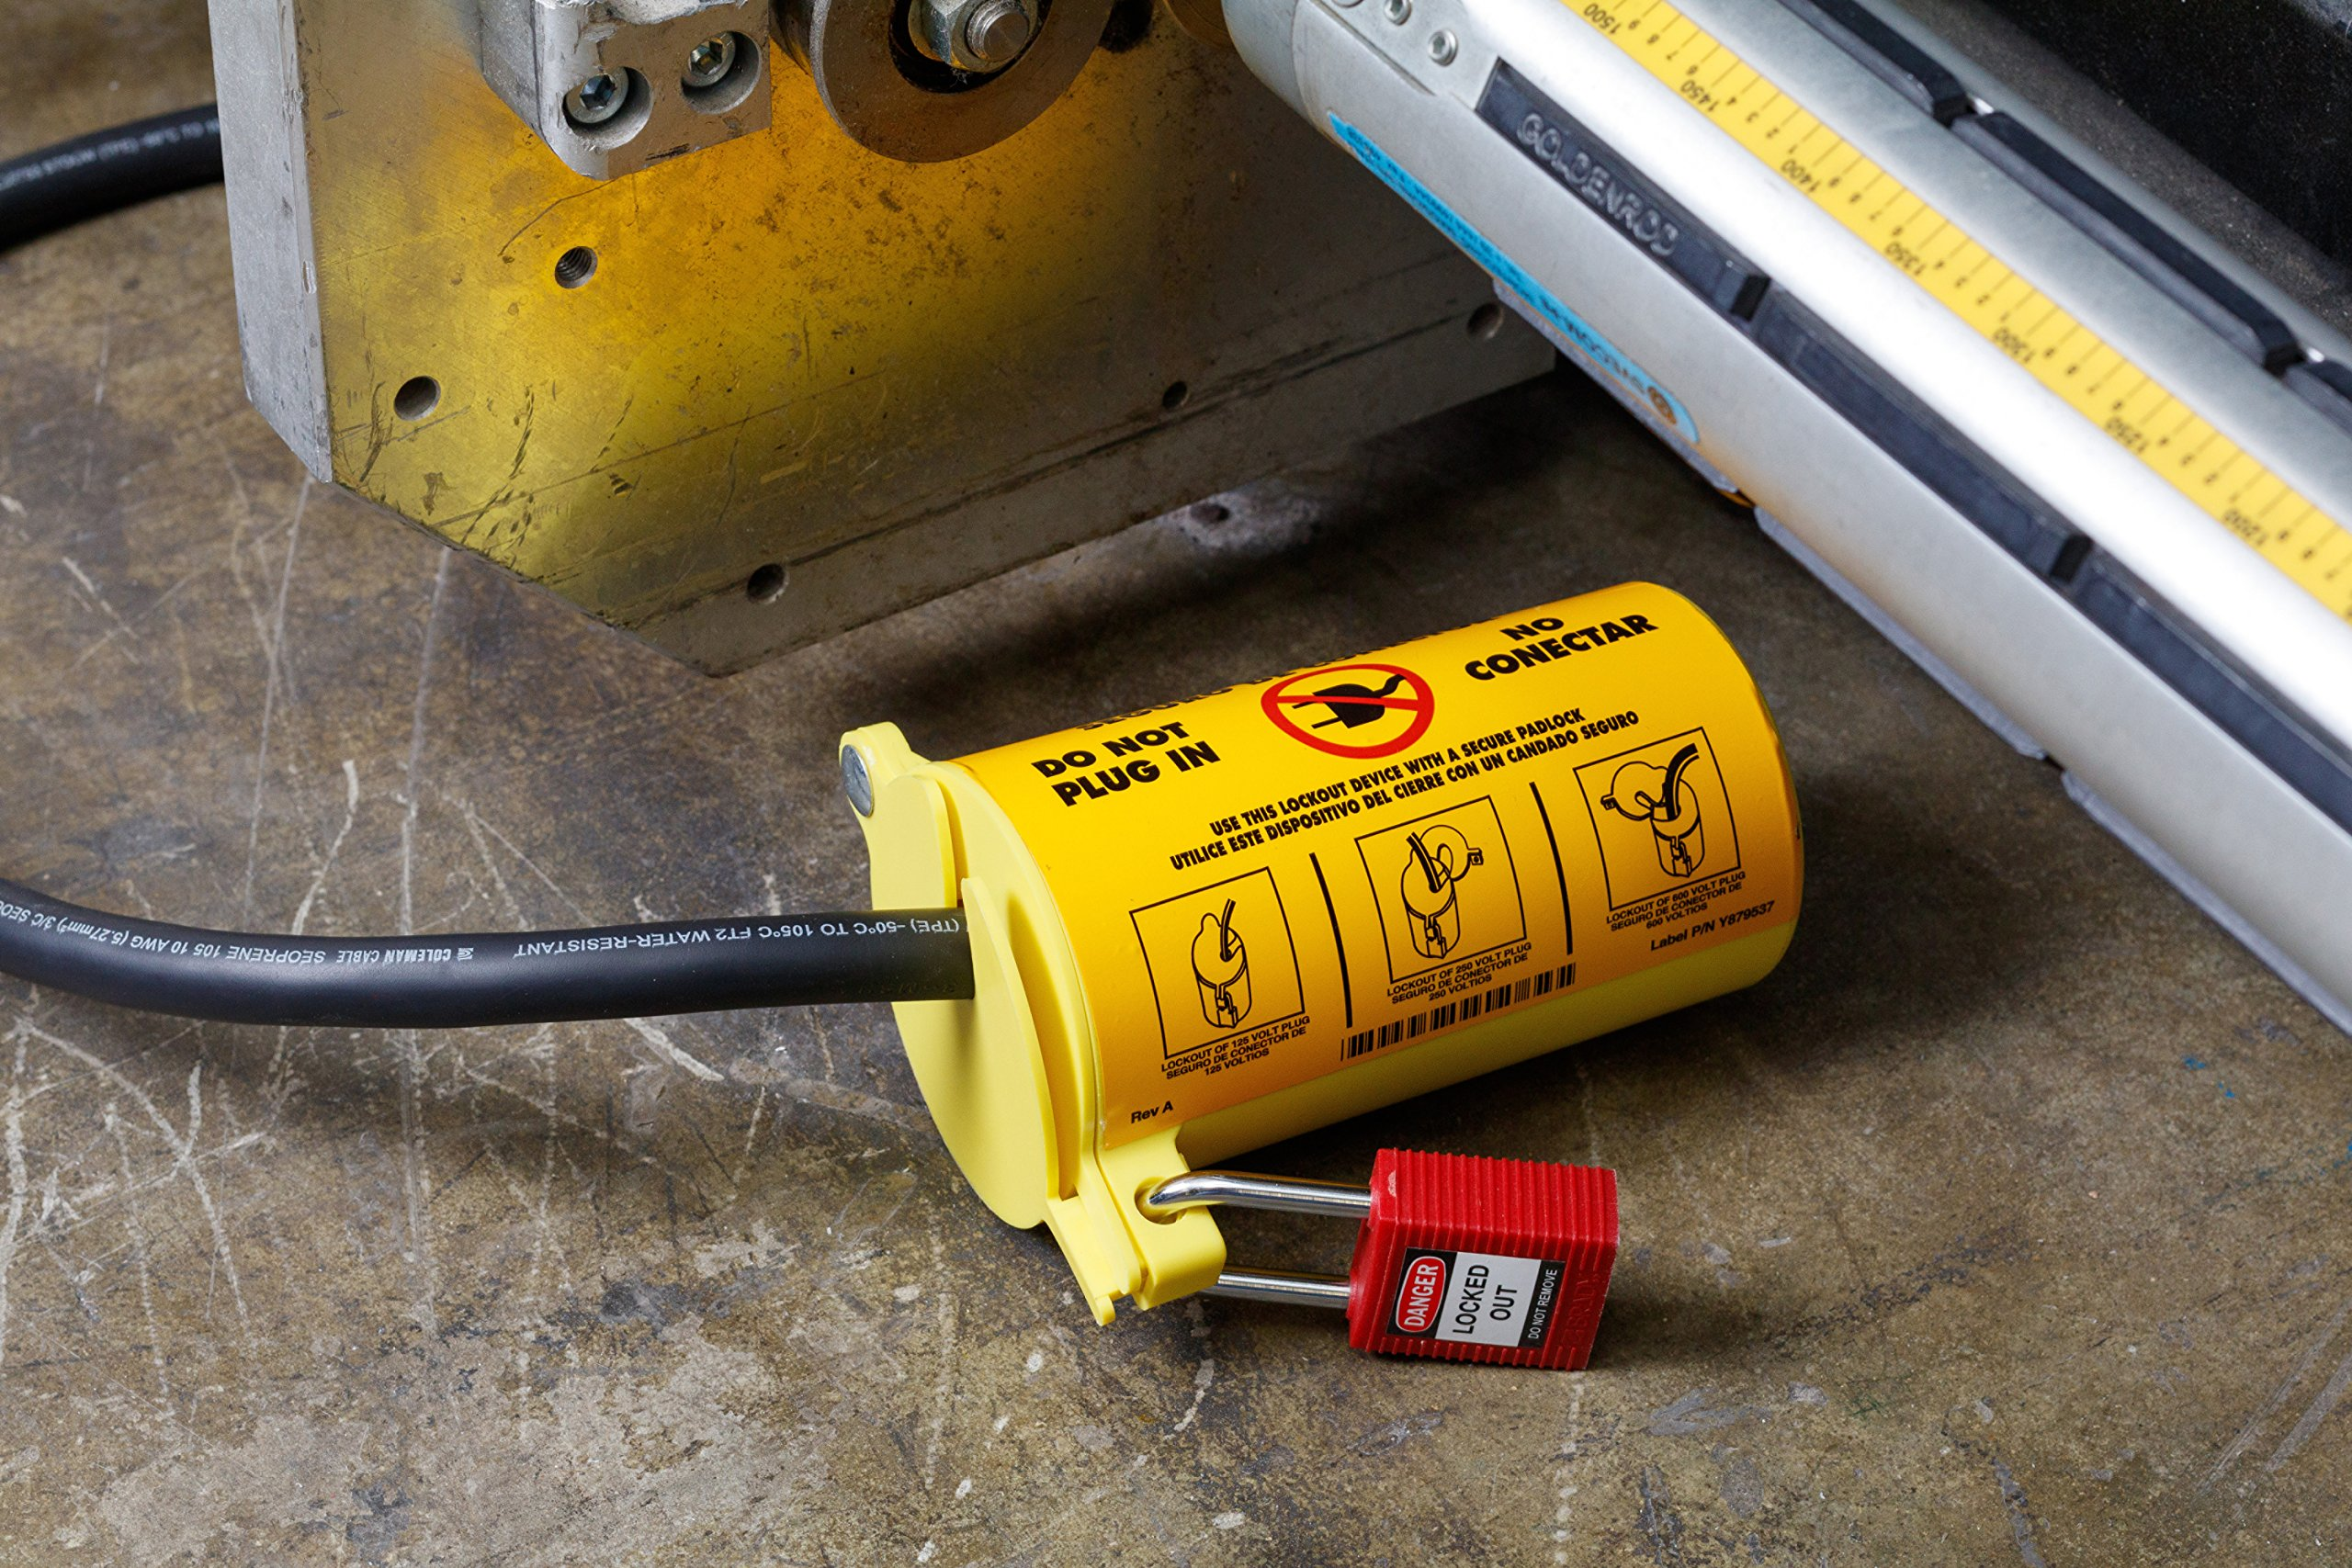 Brady Personal Electrical Lockout Toolbox Kit, Includes 2 Safety Padlocks by Brady (Image #1)